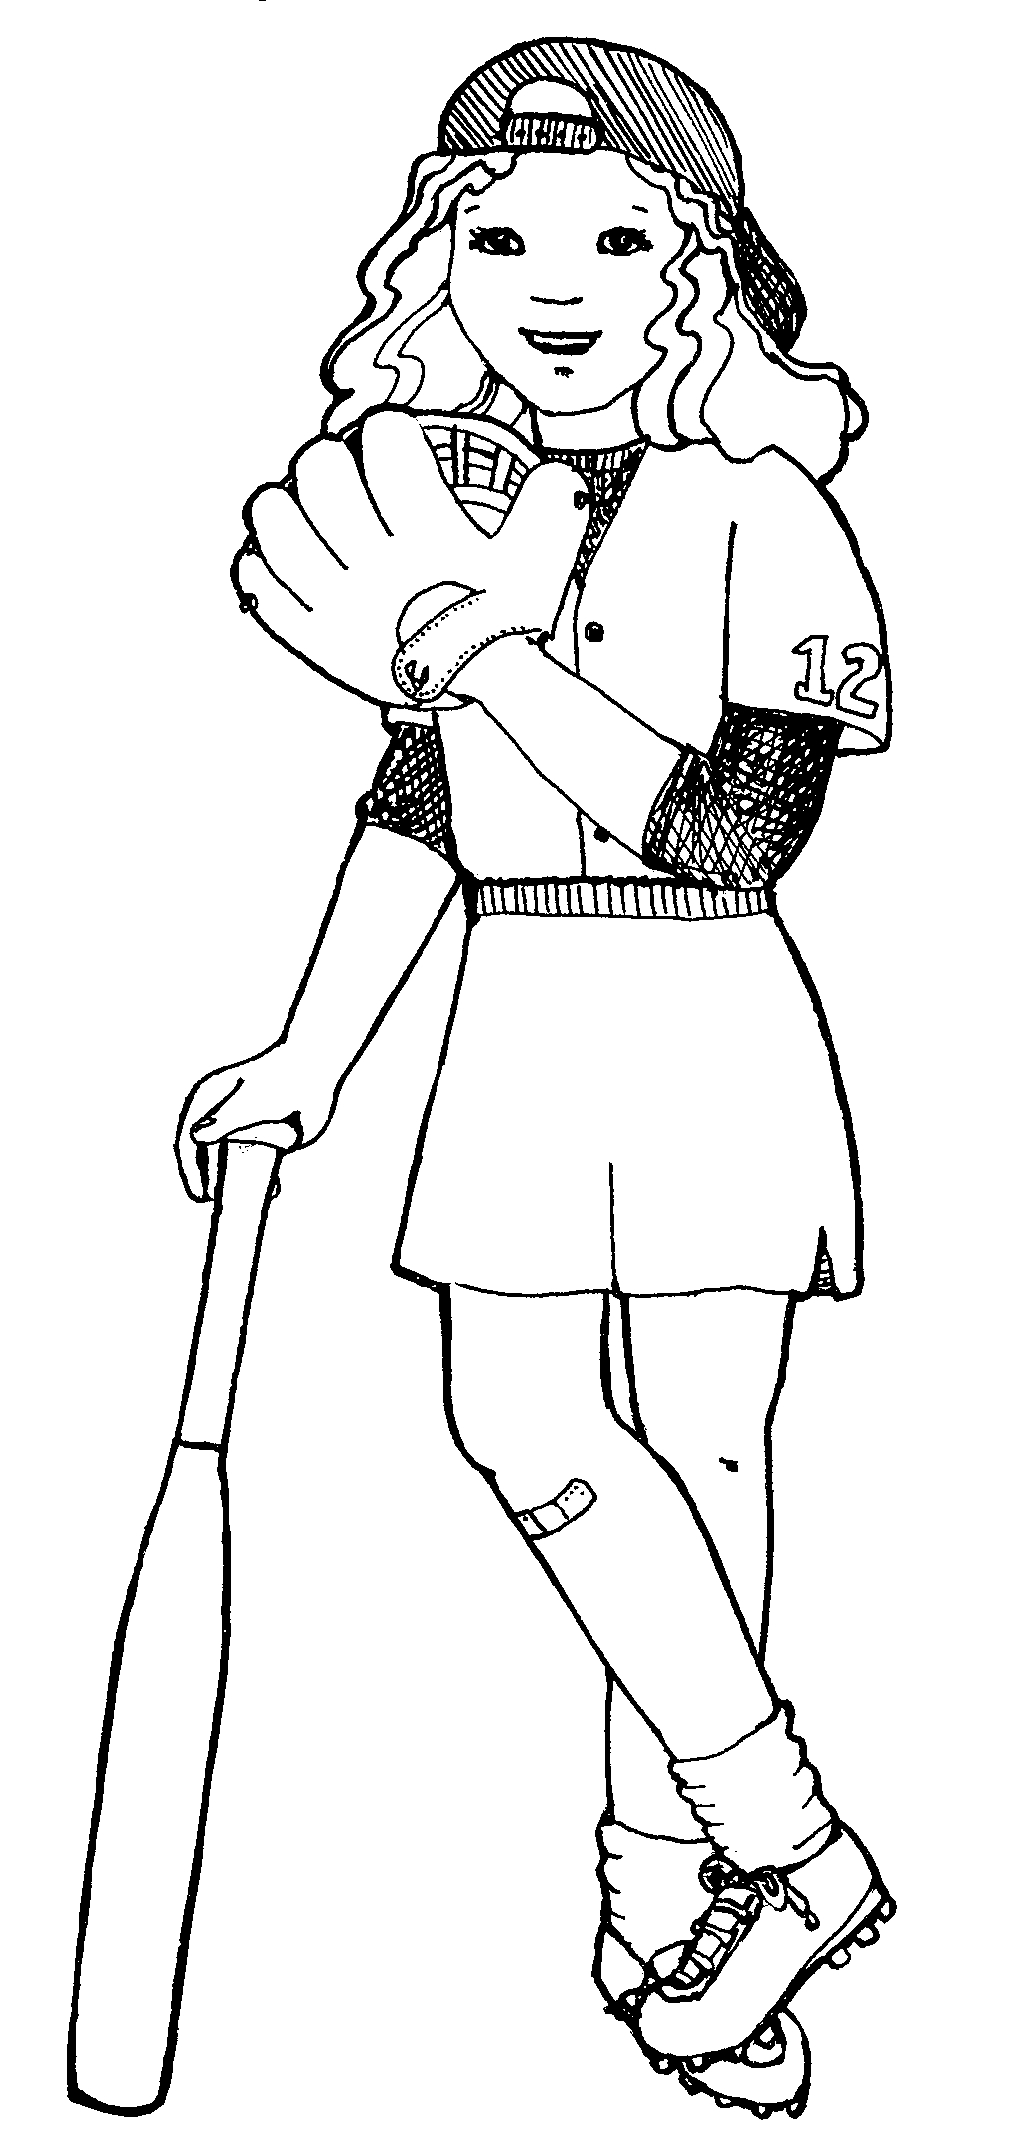 Free Female Softball Cliparts, Download Free Clip Art